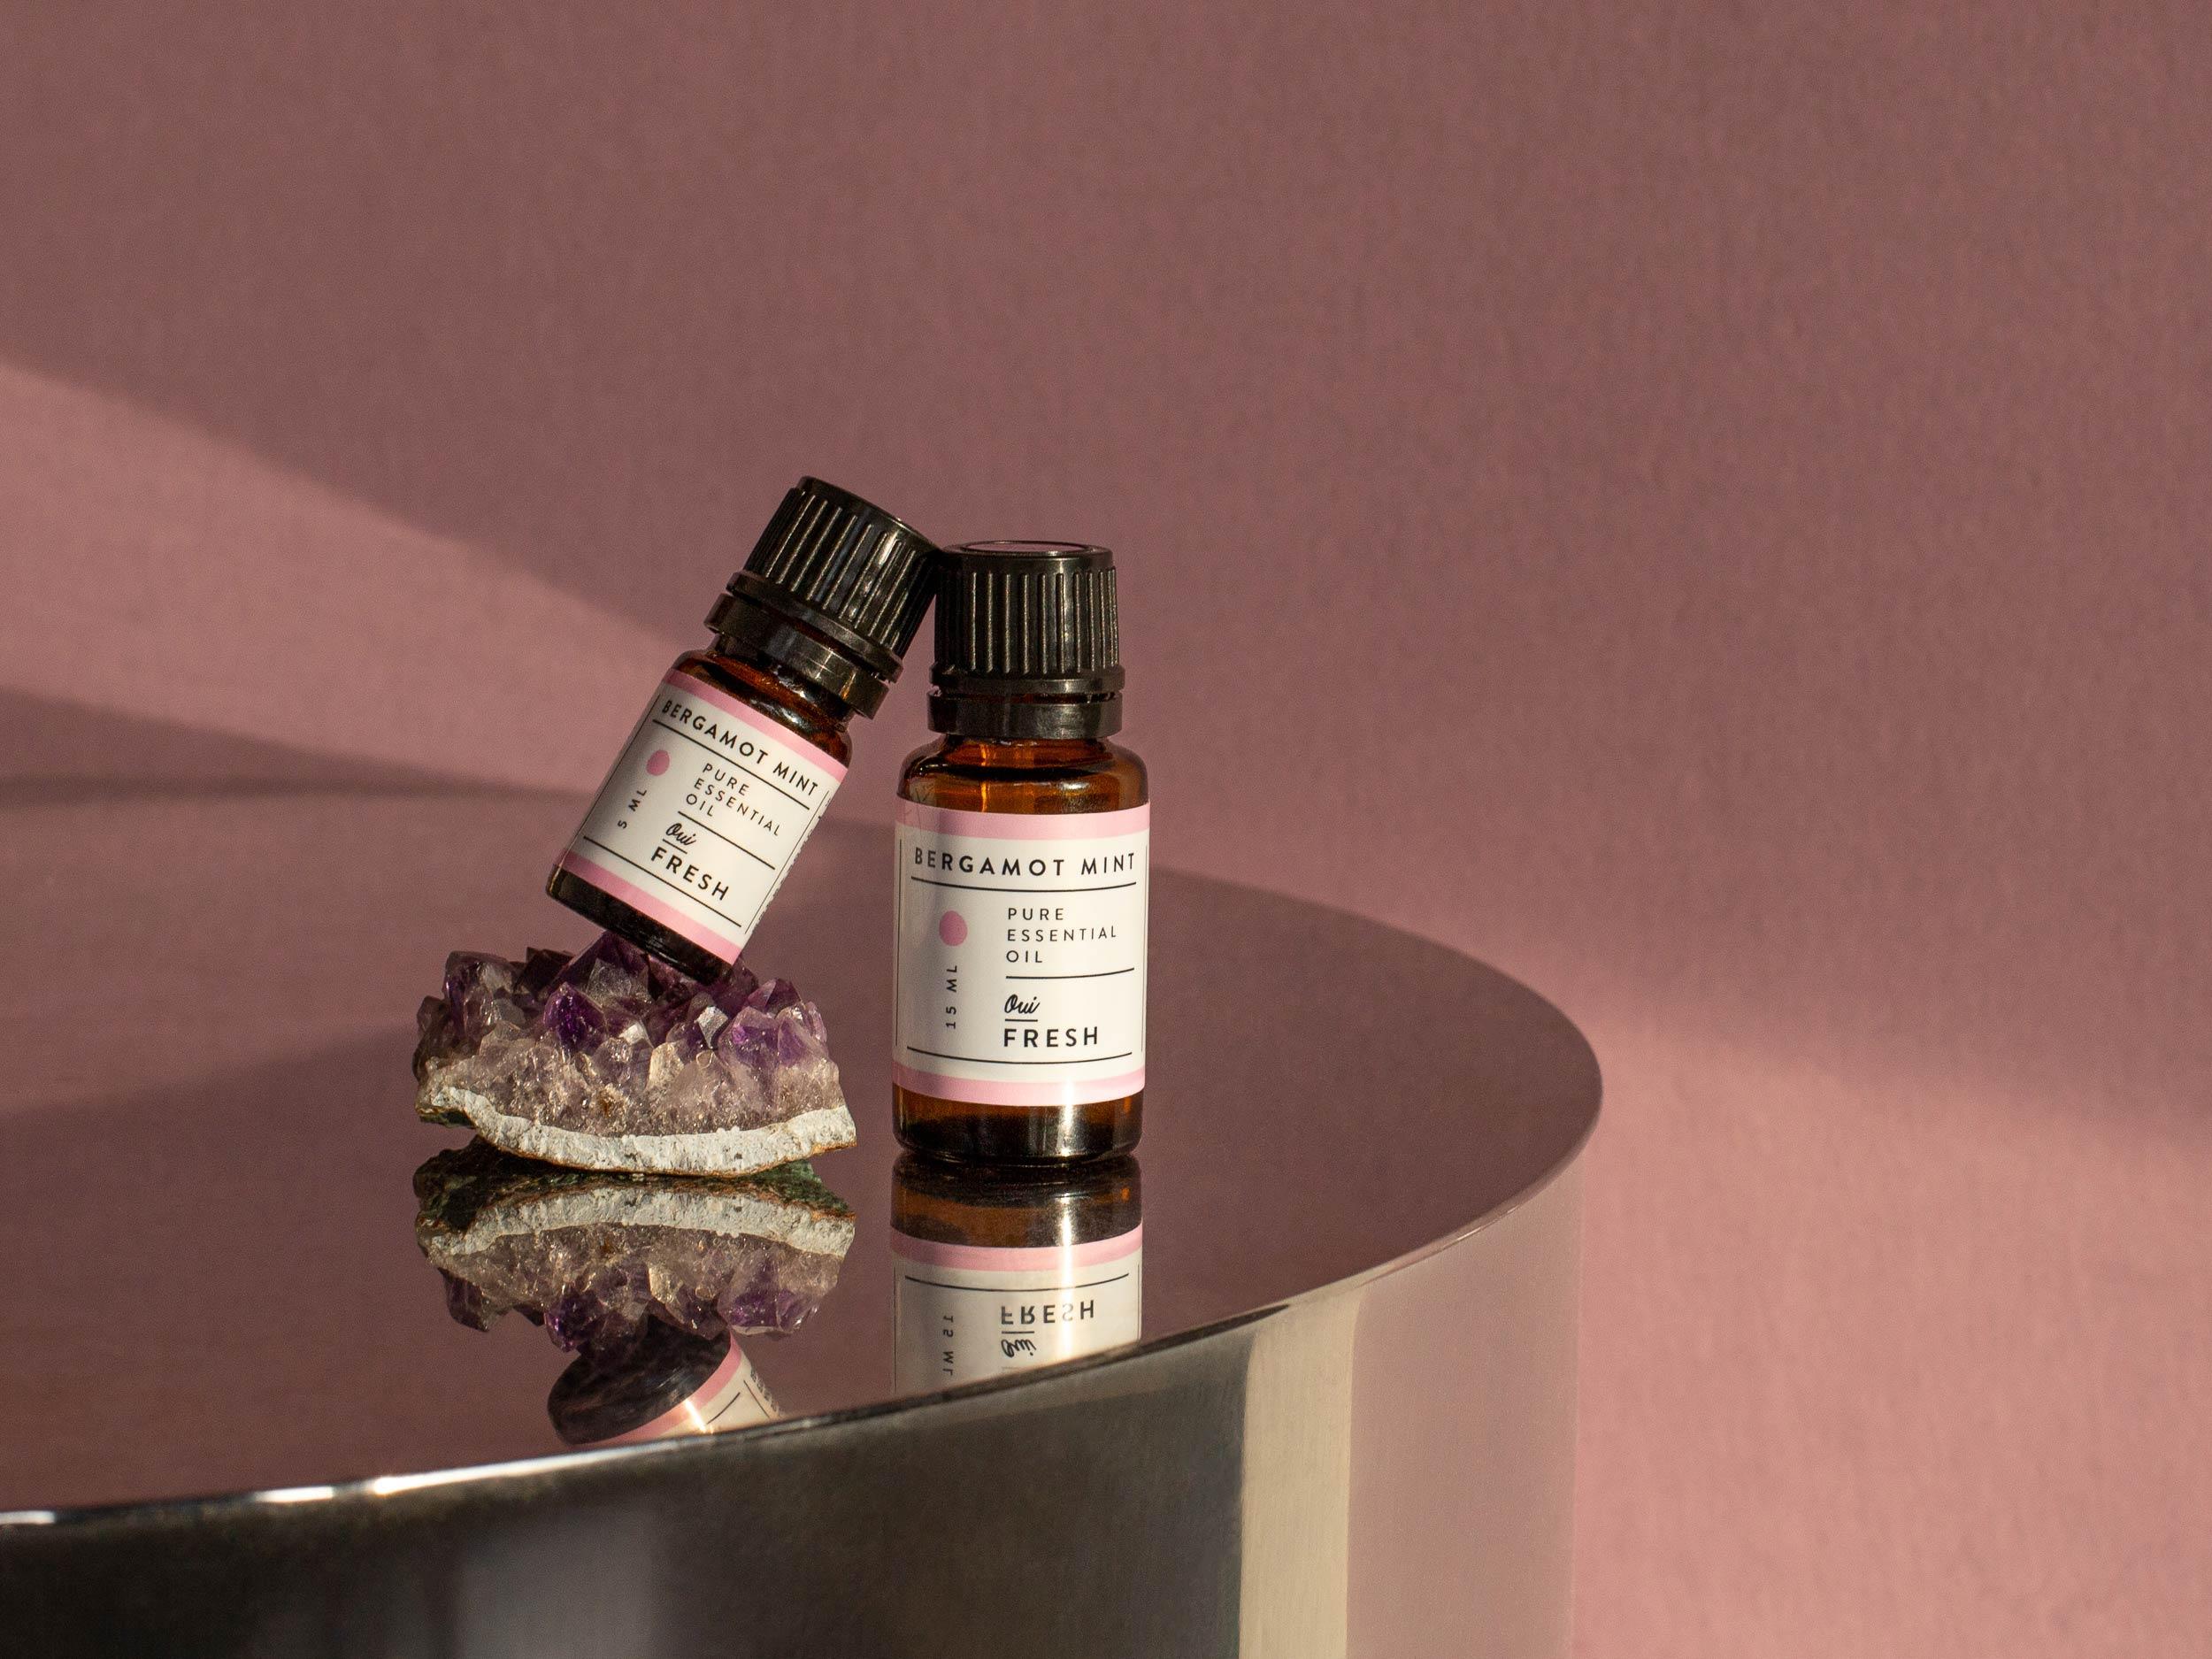 oui-fresh-essential-oil-packaging-bergamot-mint-mara-dawn.jpg